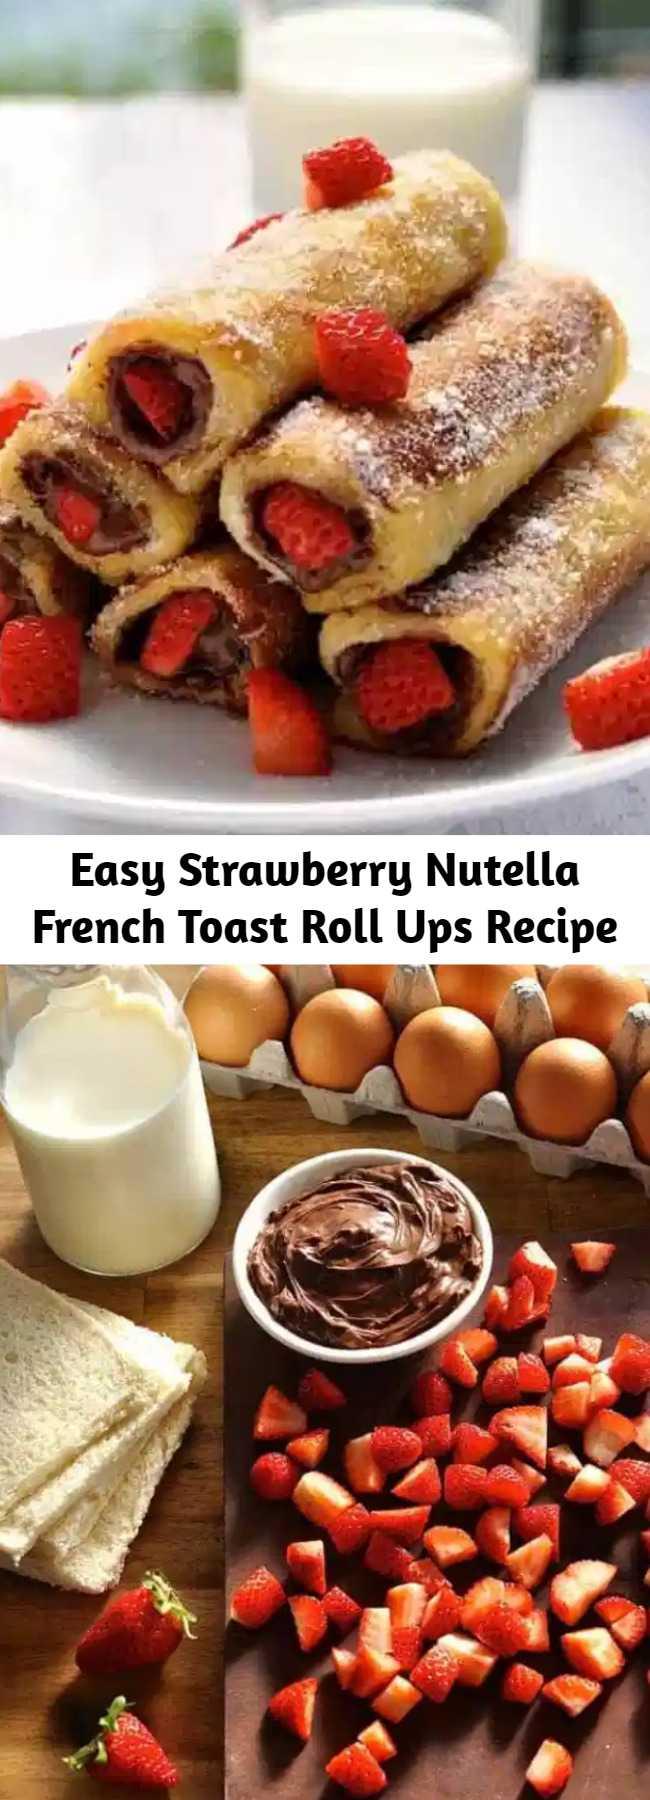 Easy Strawberry Nutella French Toast Roll Ups Recipe - These french toast roll ups taste like an awesome doughnut!